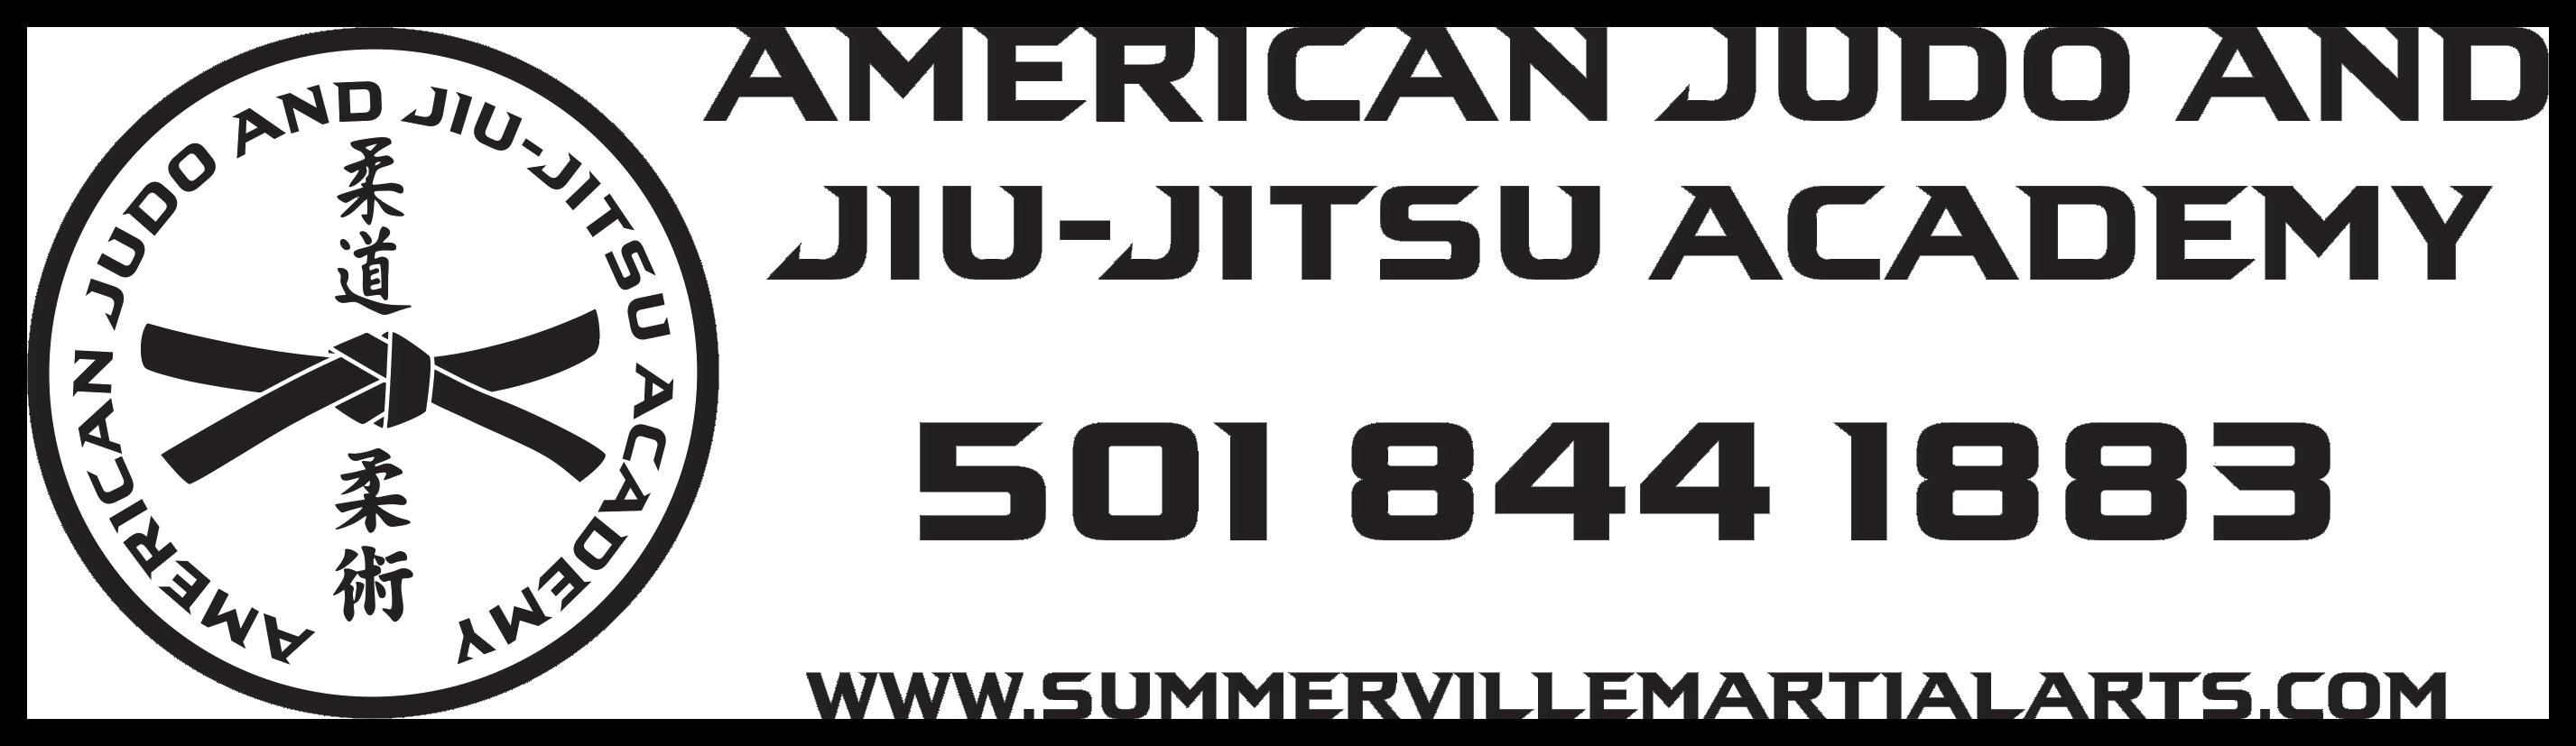 American Judo and Jiu-Jitsu Academy